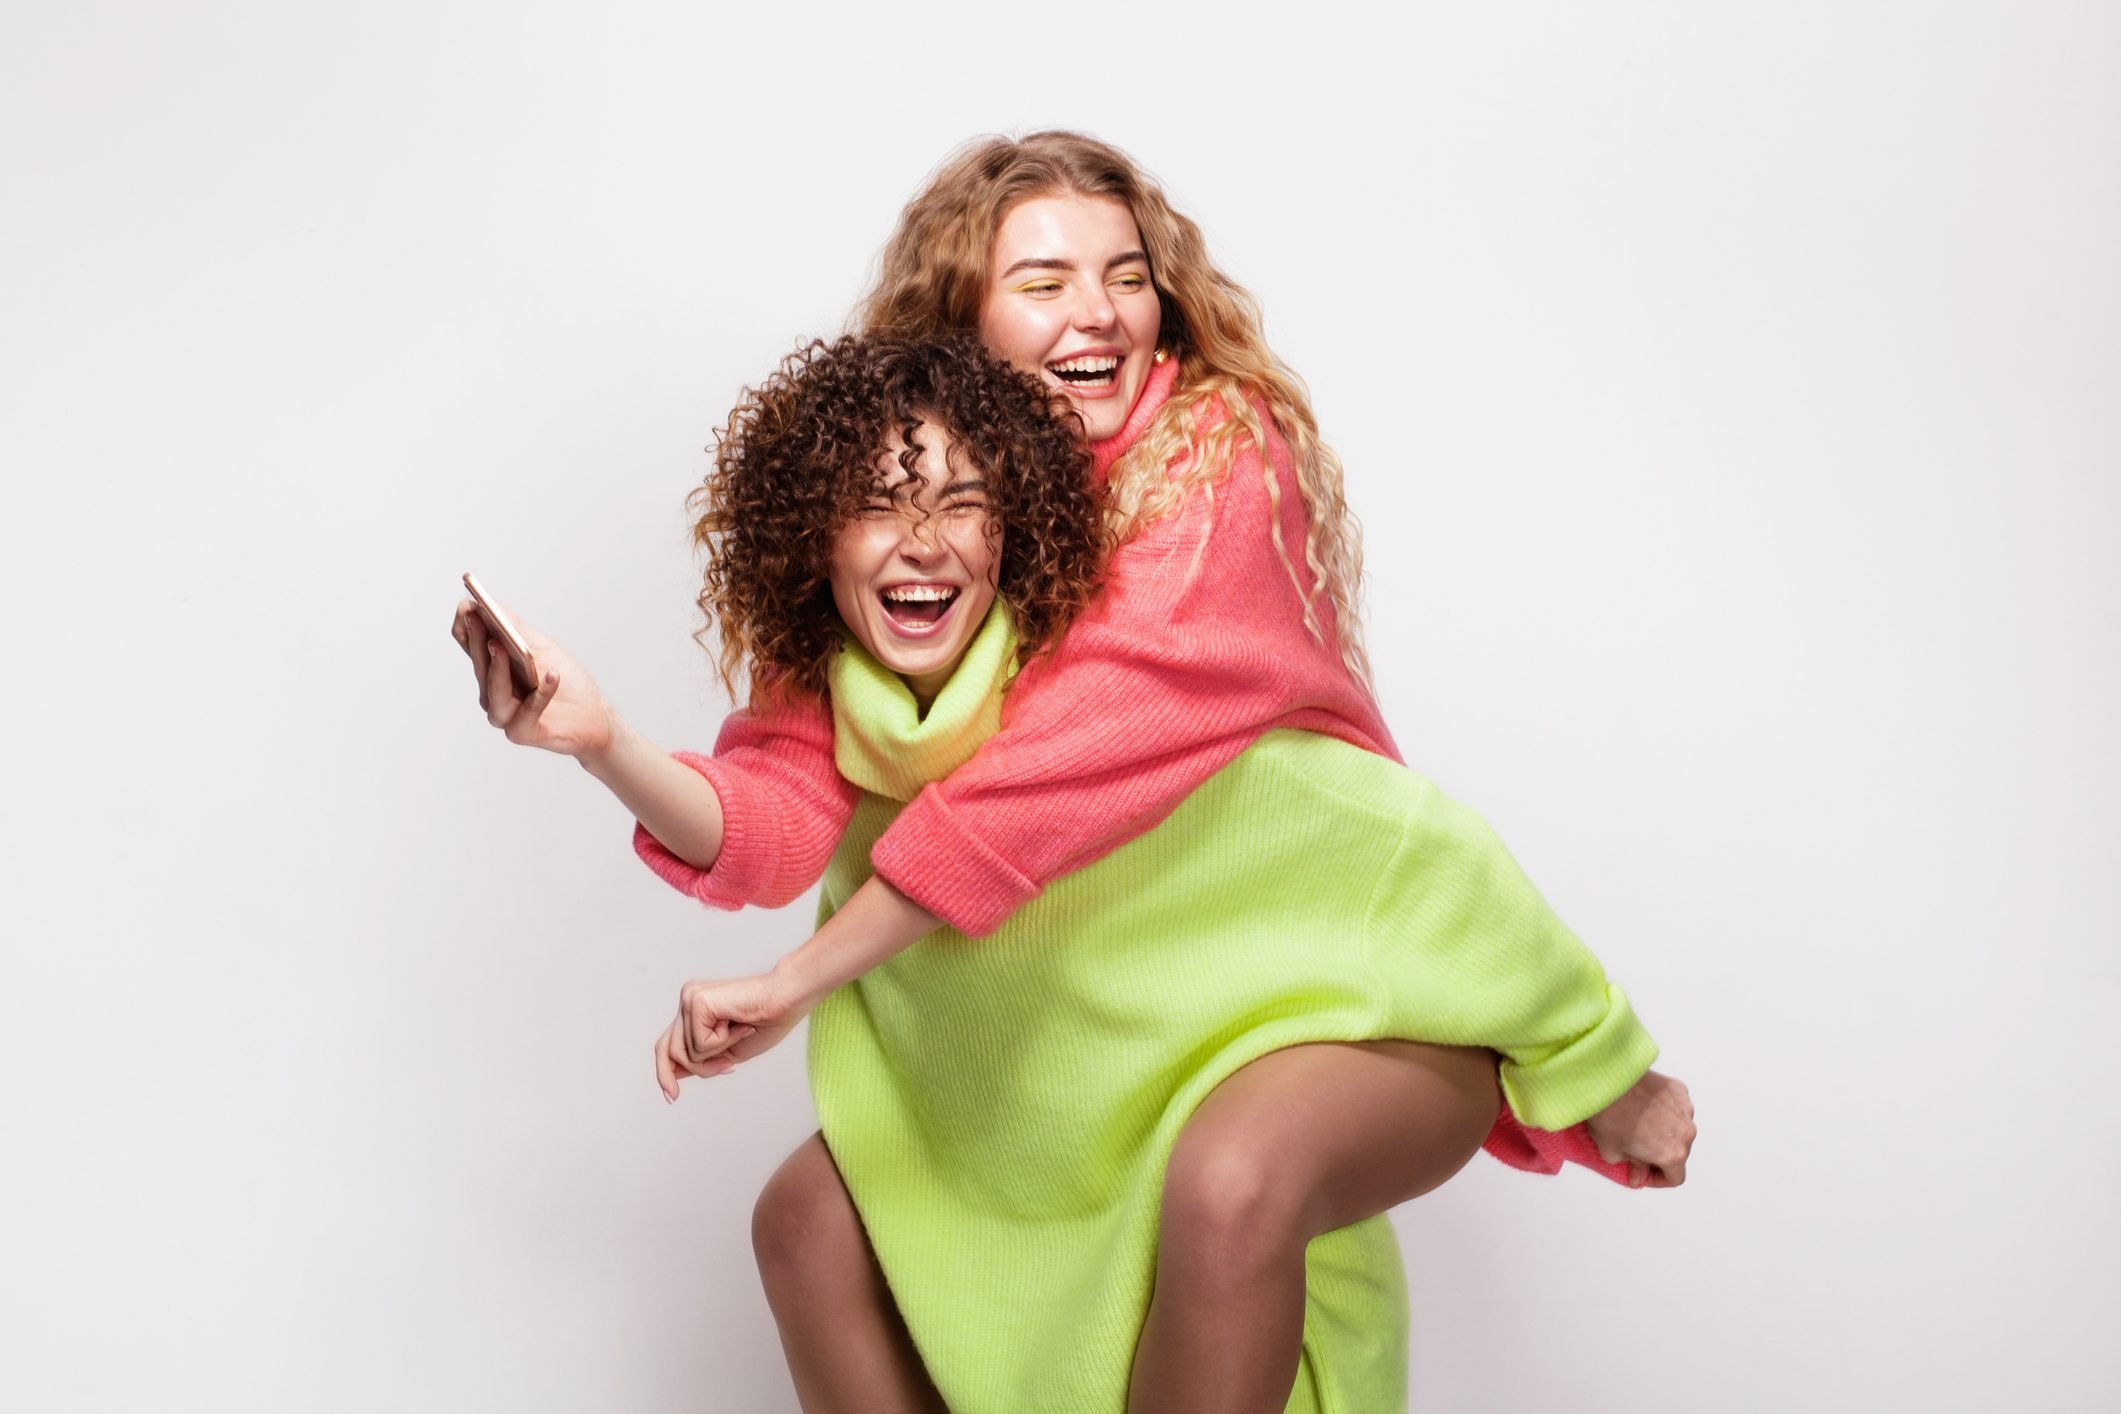 Two joyful beautiful women having fun together